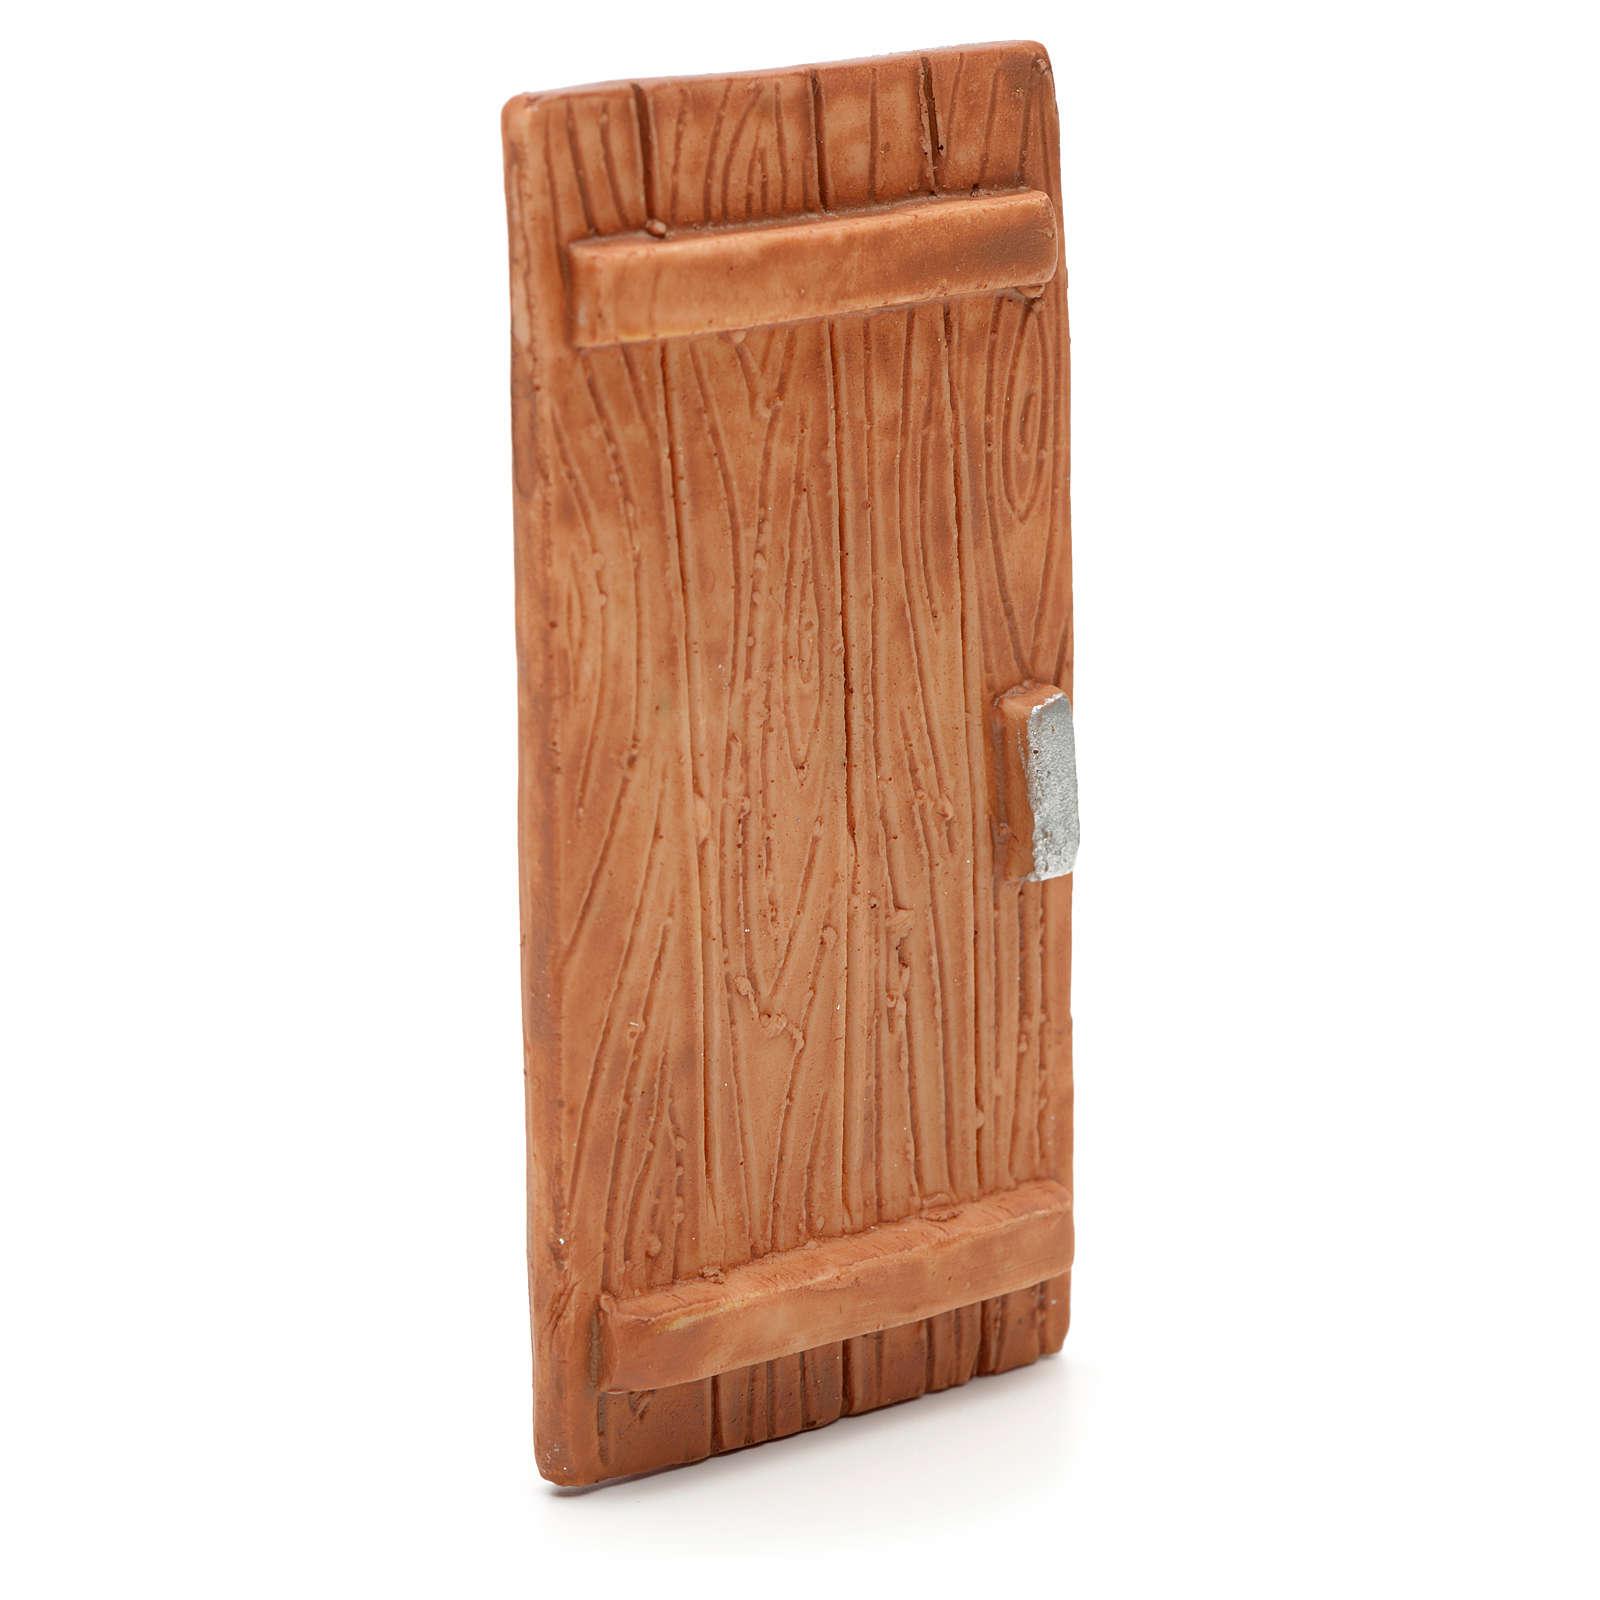 Puerta cm 8,5x4,5 en resina 4